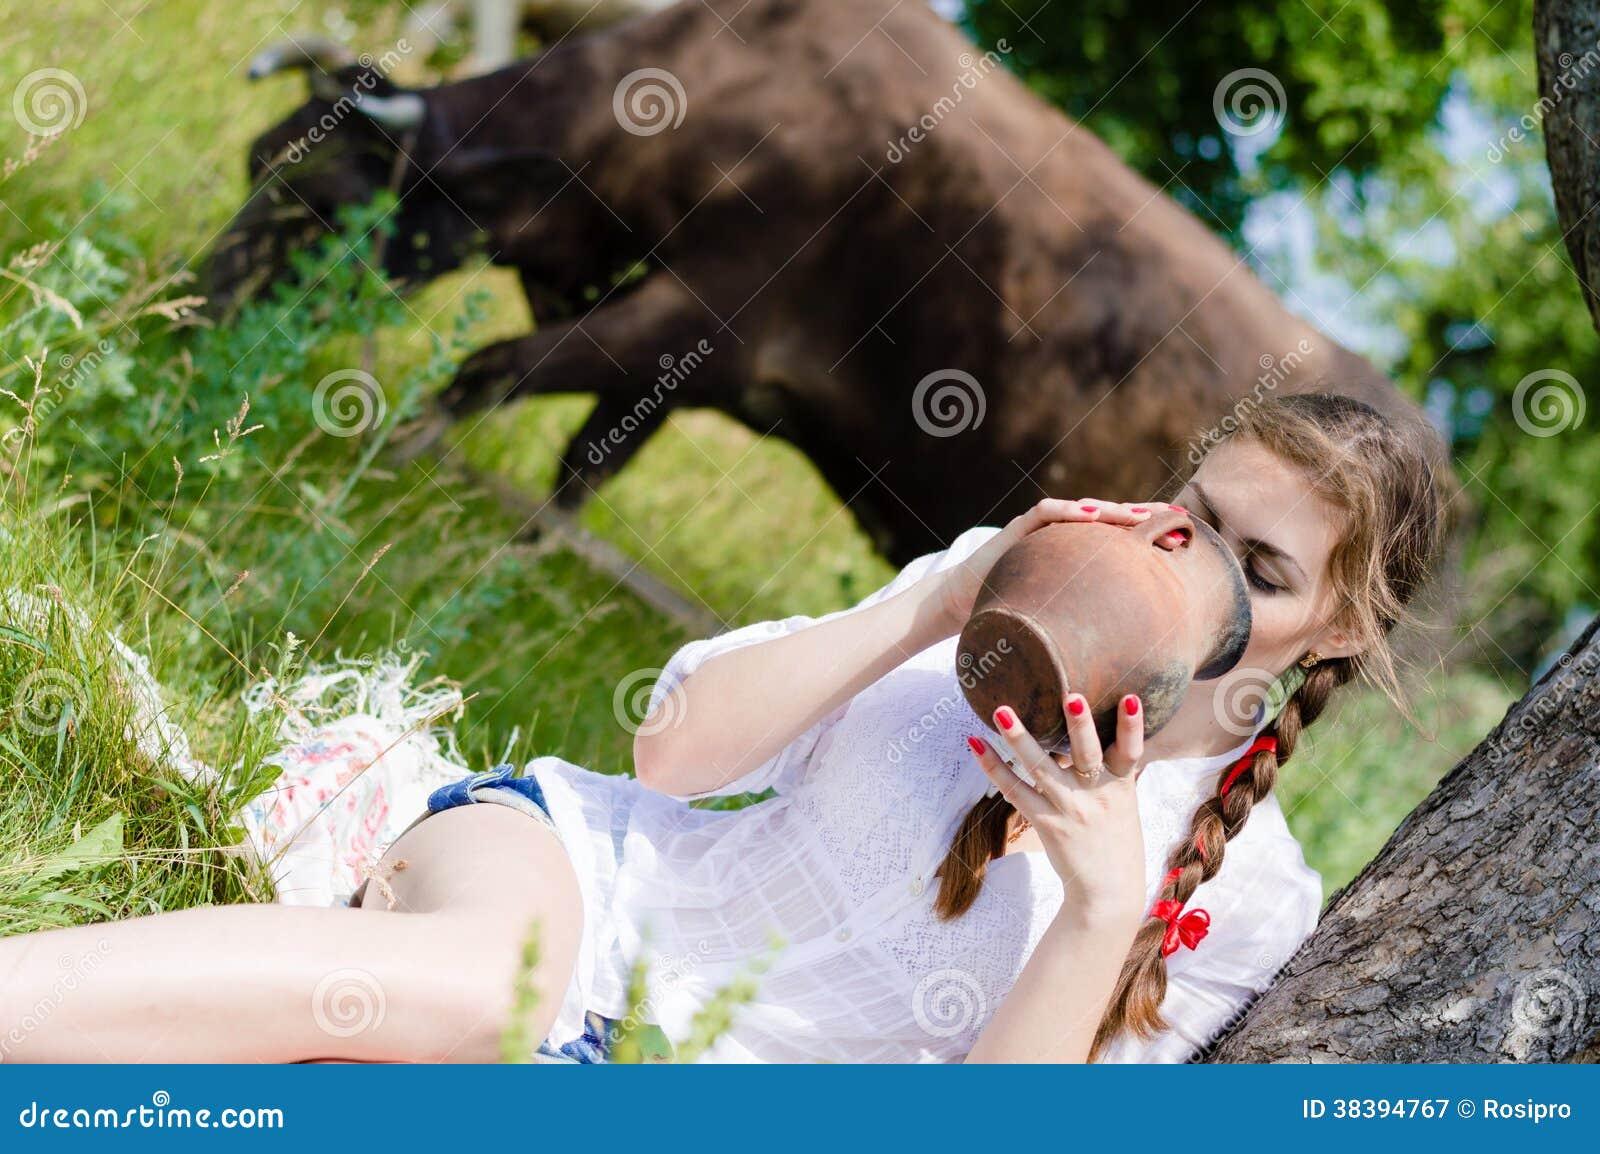 image Milk a beautiful cow